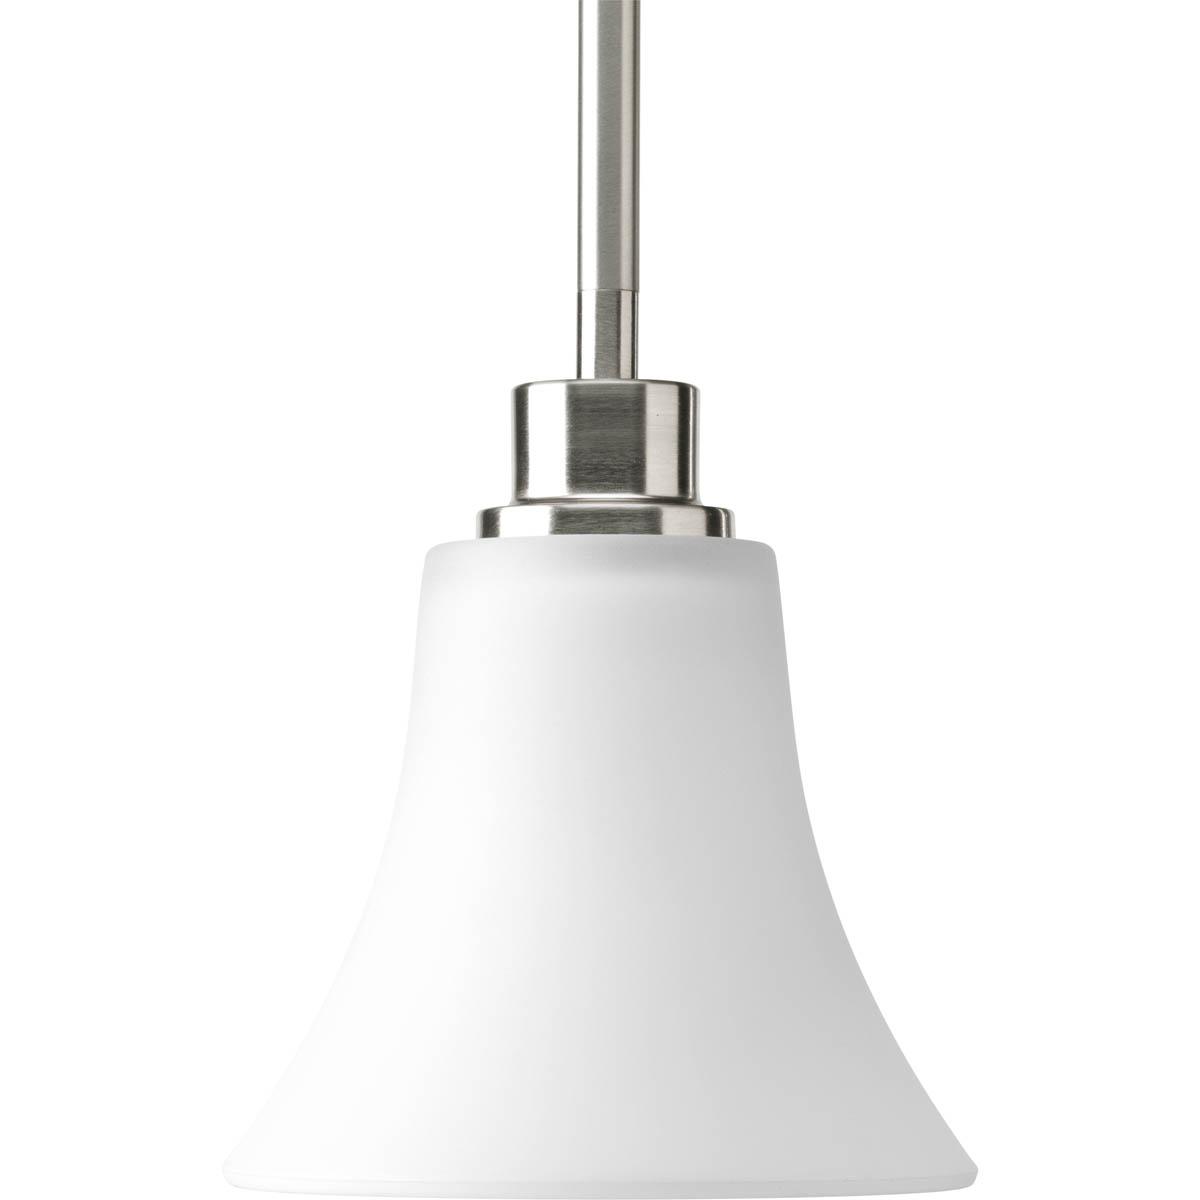 2019 Progress Lighting P5270 09 Pendant Light Fixtures – Crescent Electric  Supply Company In Erico 1 Light Single Bell Pendants (View 1 of 20)